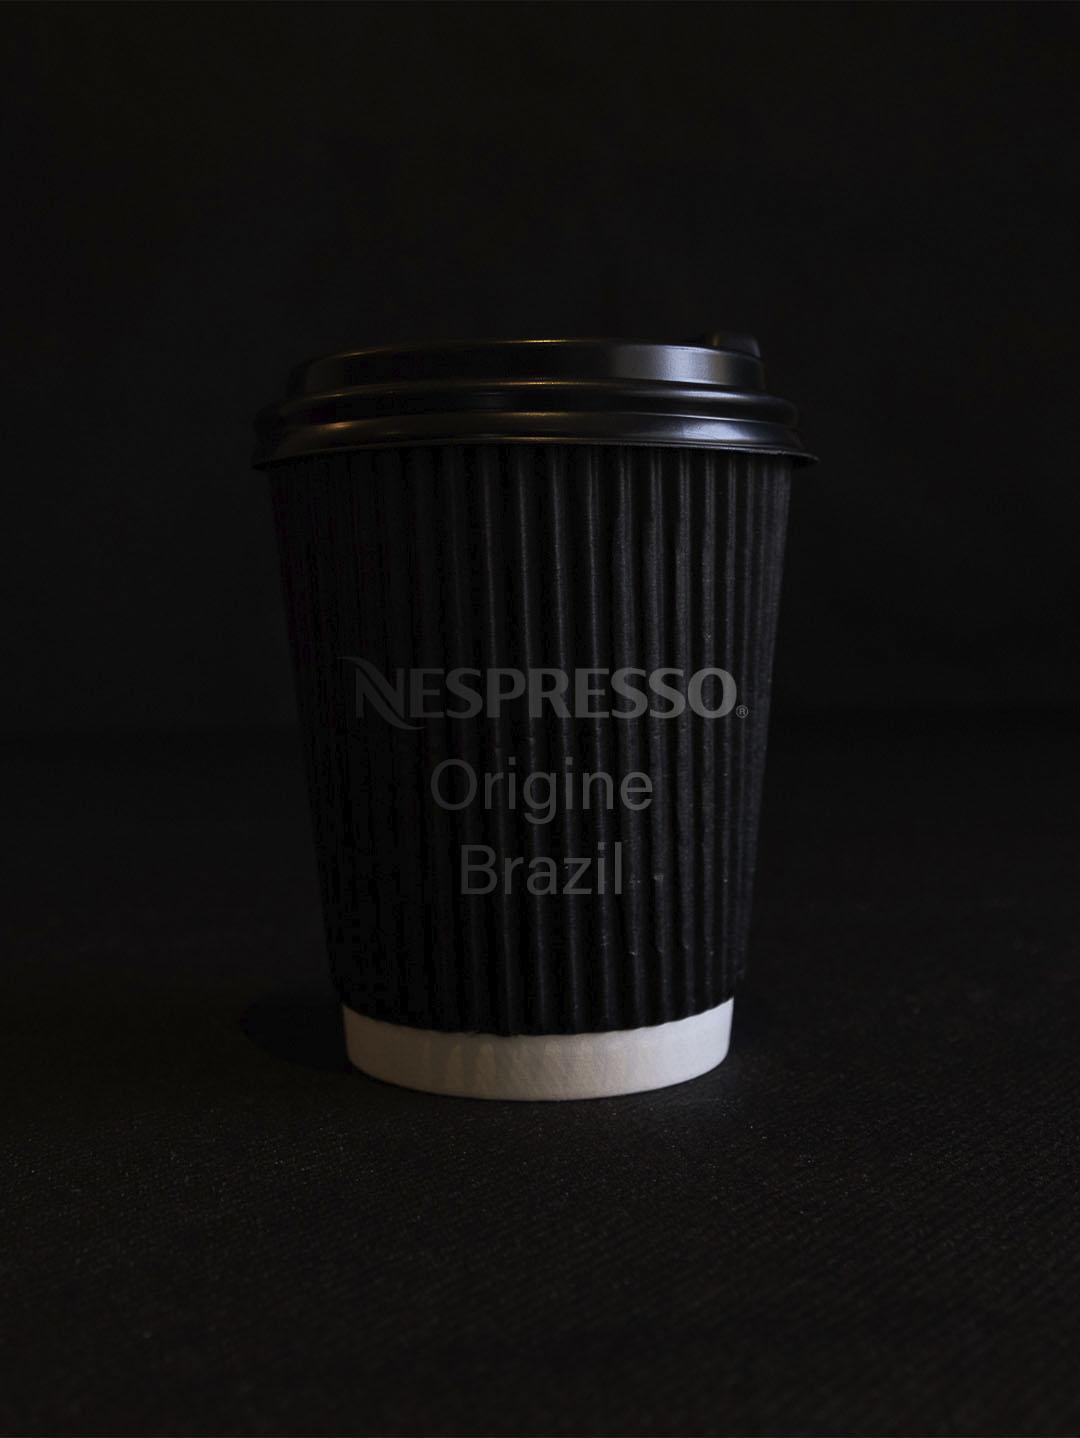 Nespresso origine brazil coeur gourmand